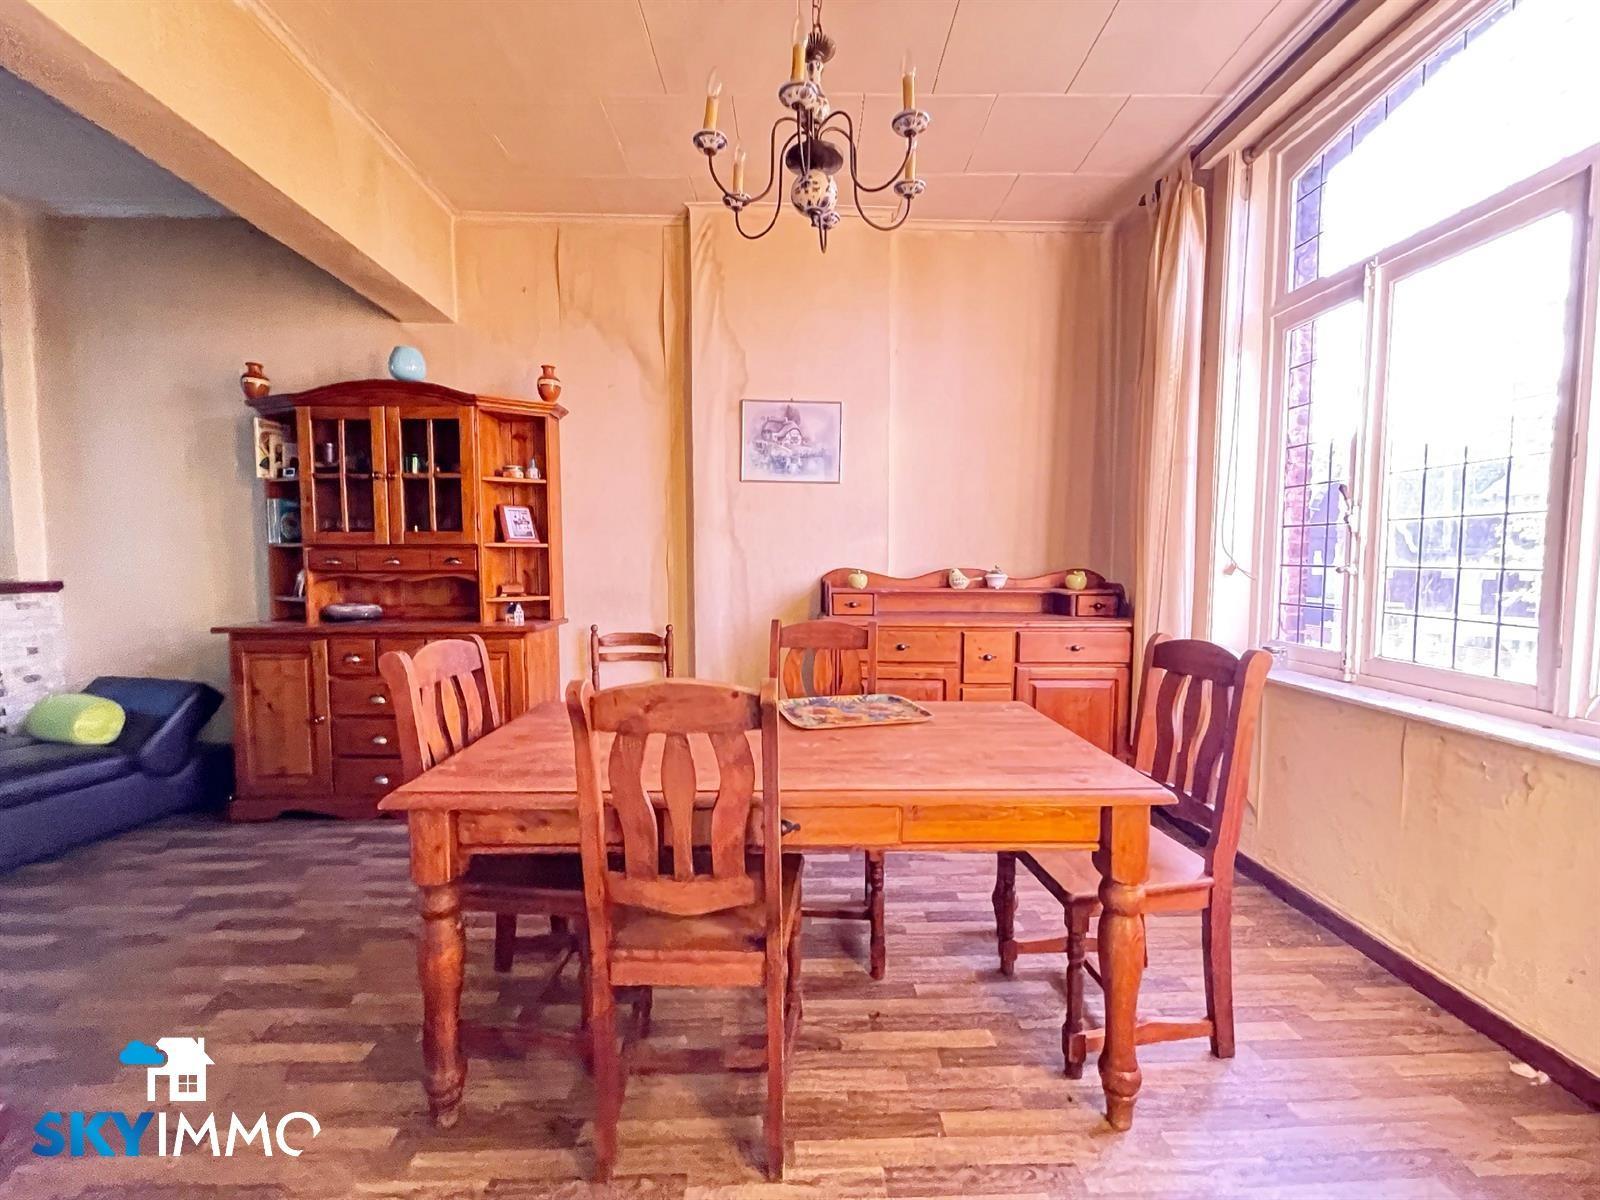 Maison - Seraing Jemeppesur-Meuse - #4383857-4